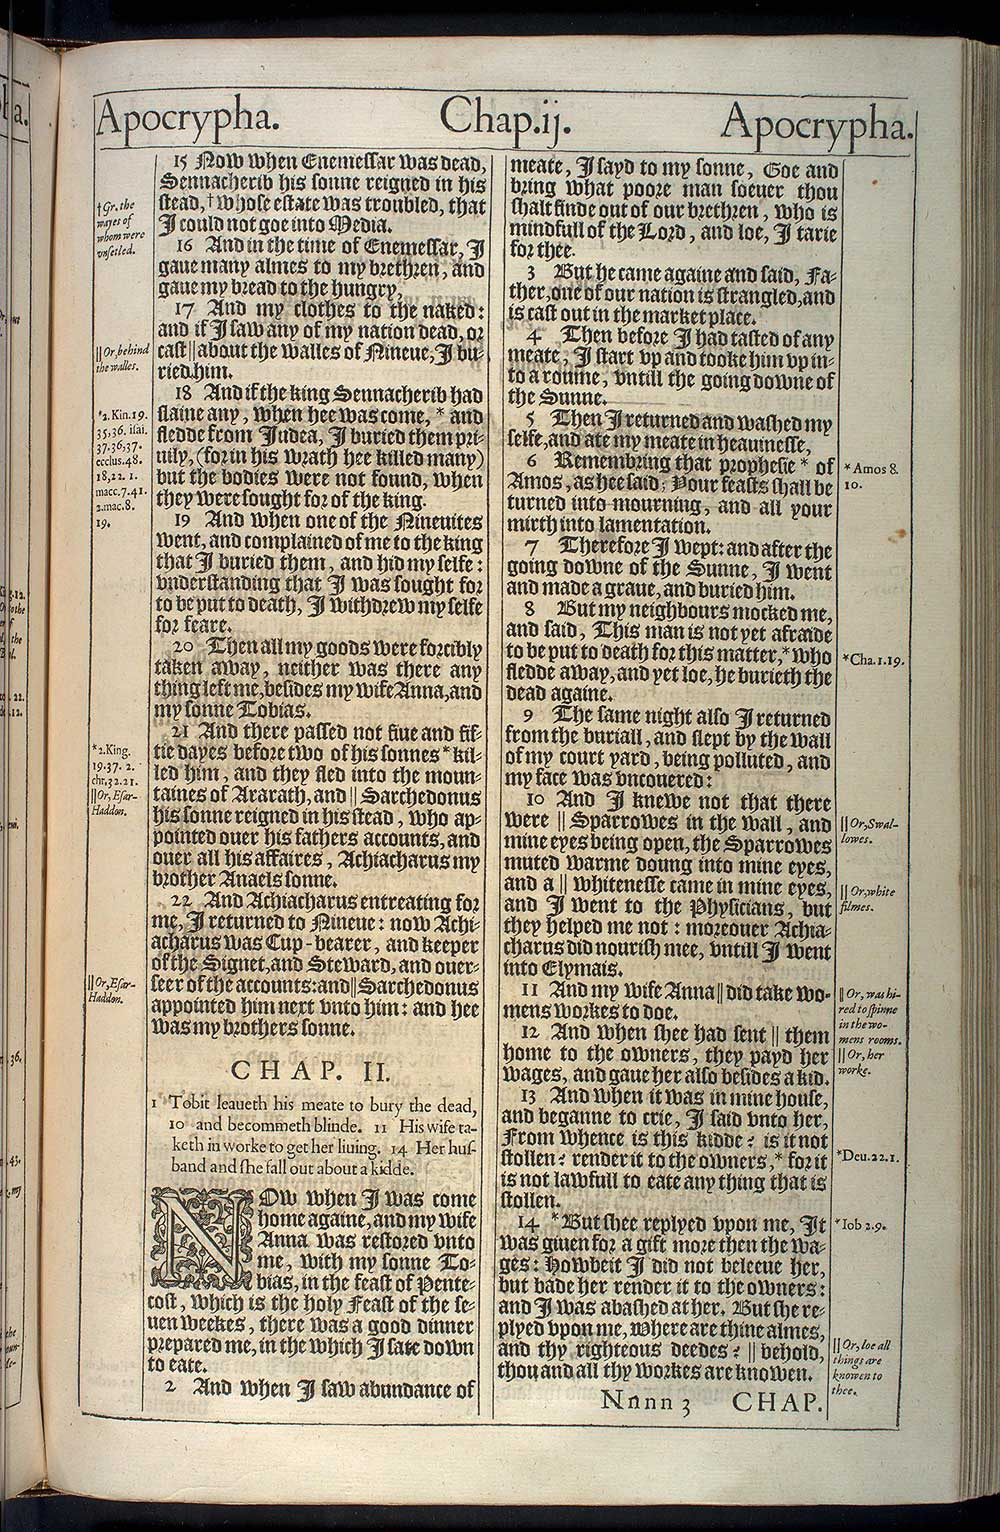 Tobit Chapter 1 Original 1611 Bible Scan